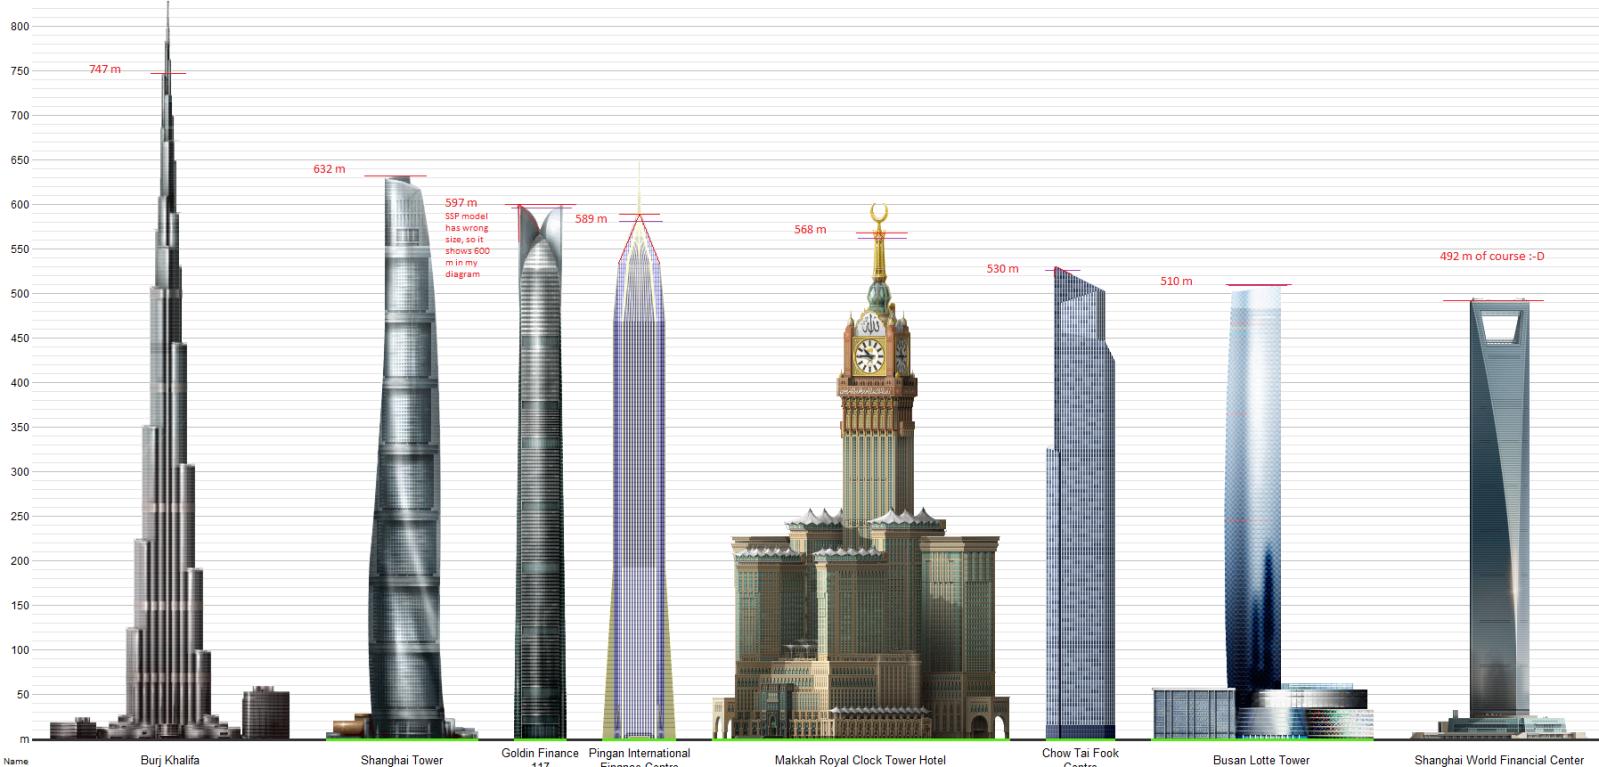 Makkah Royal Clock Tower Hotel List Of Tallest Buildings Building Clock Tower